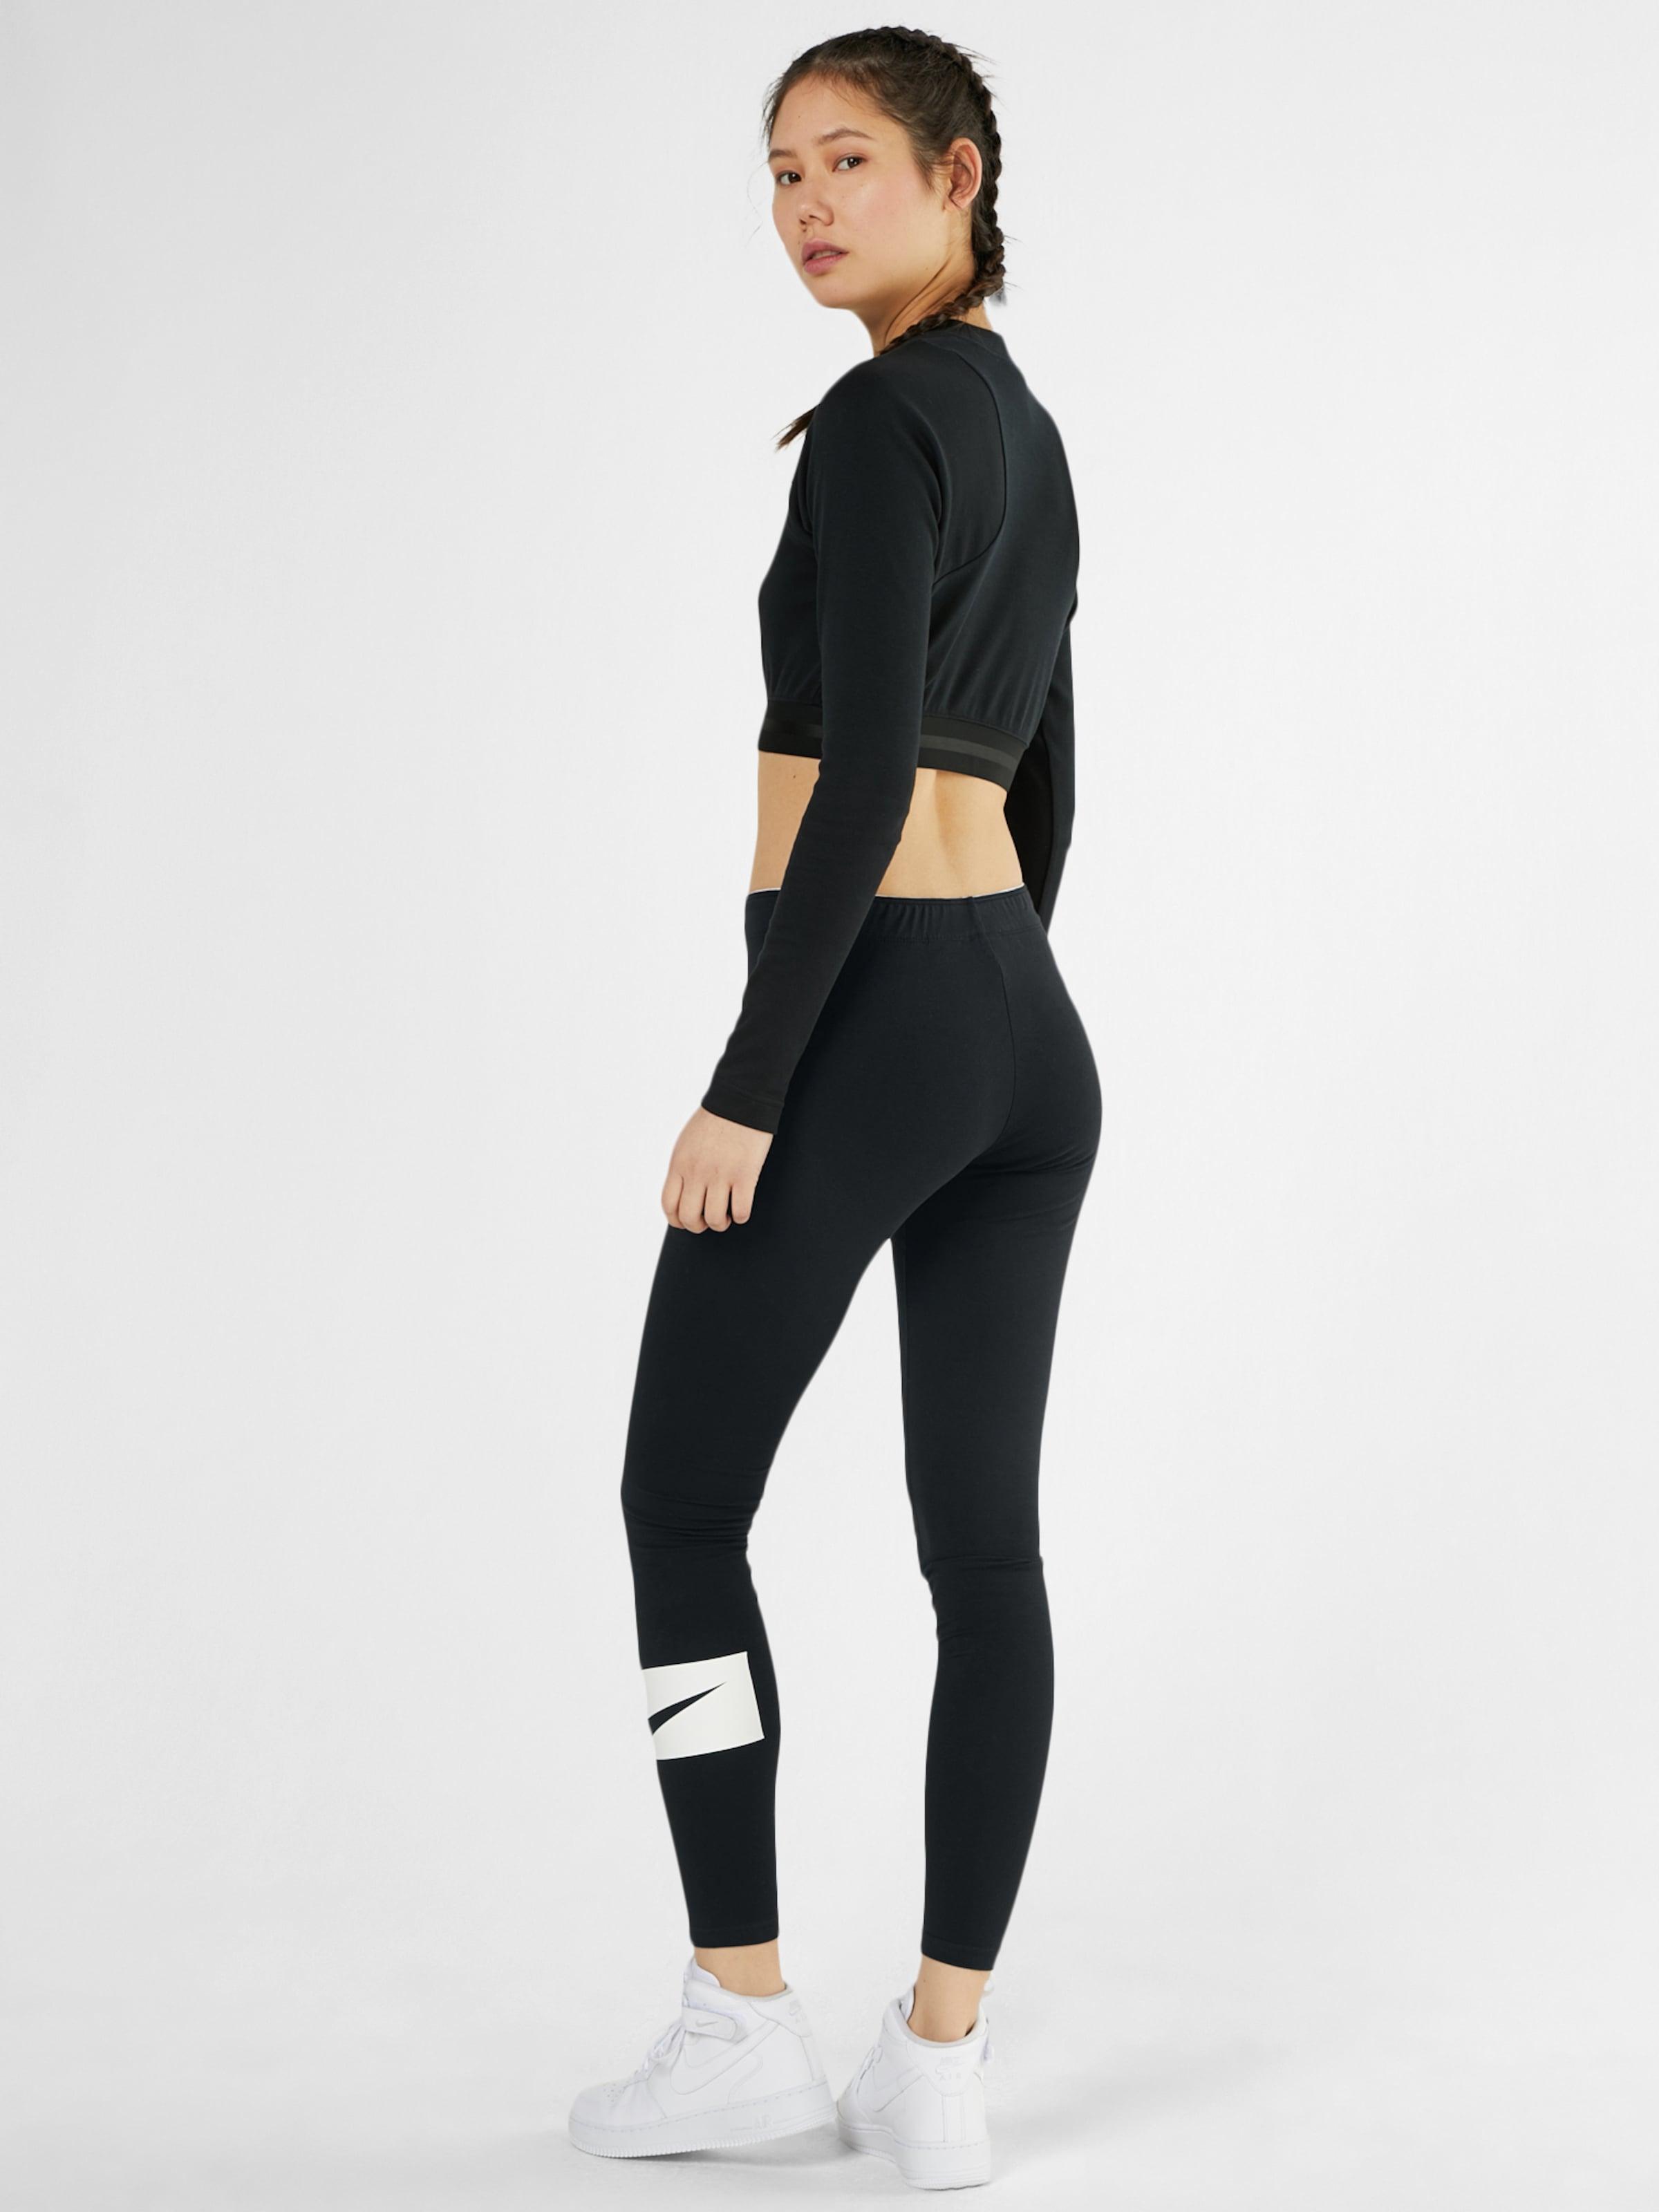 Billig Gutes Verkauf Bilder Nike Sportswear Leggings kXLsw0U0V